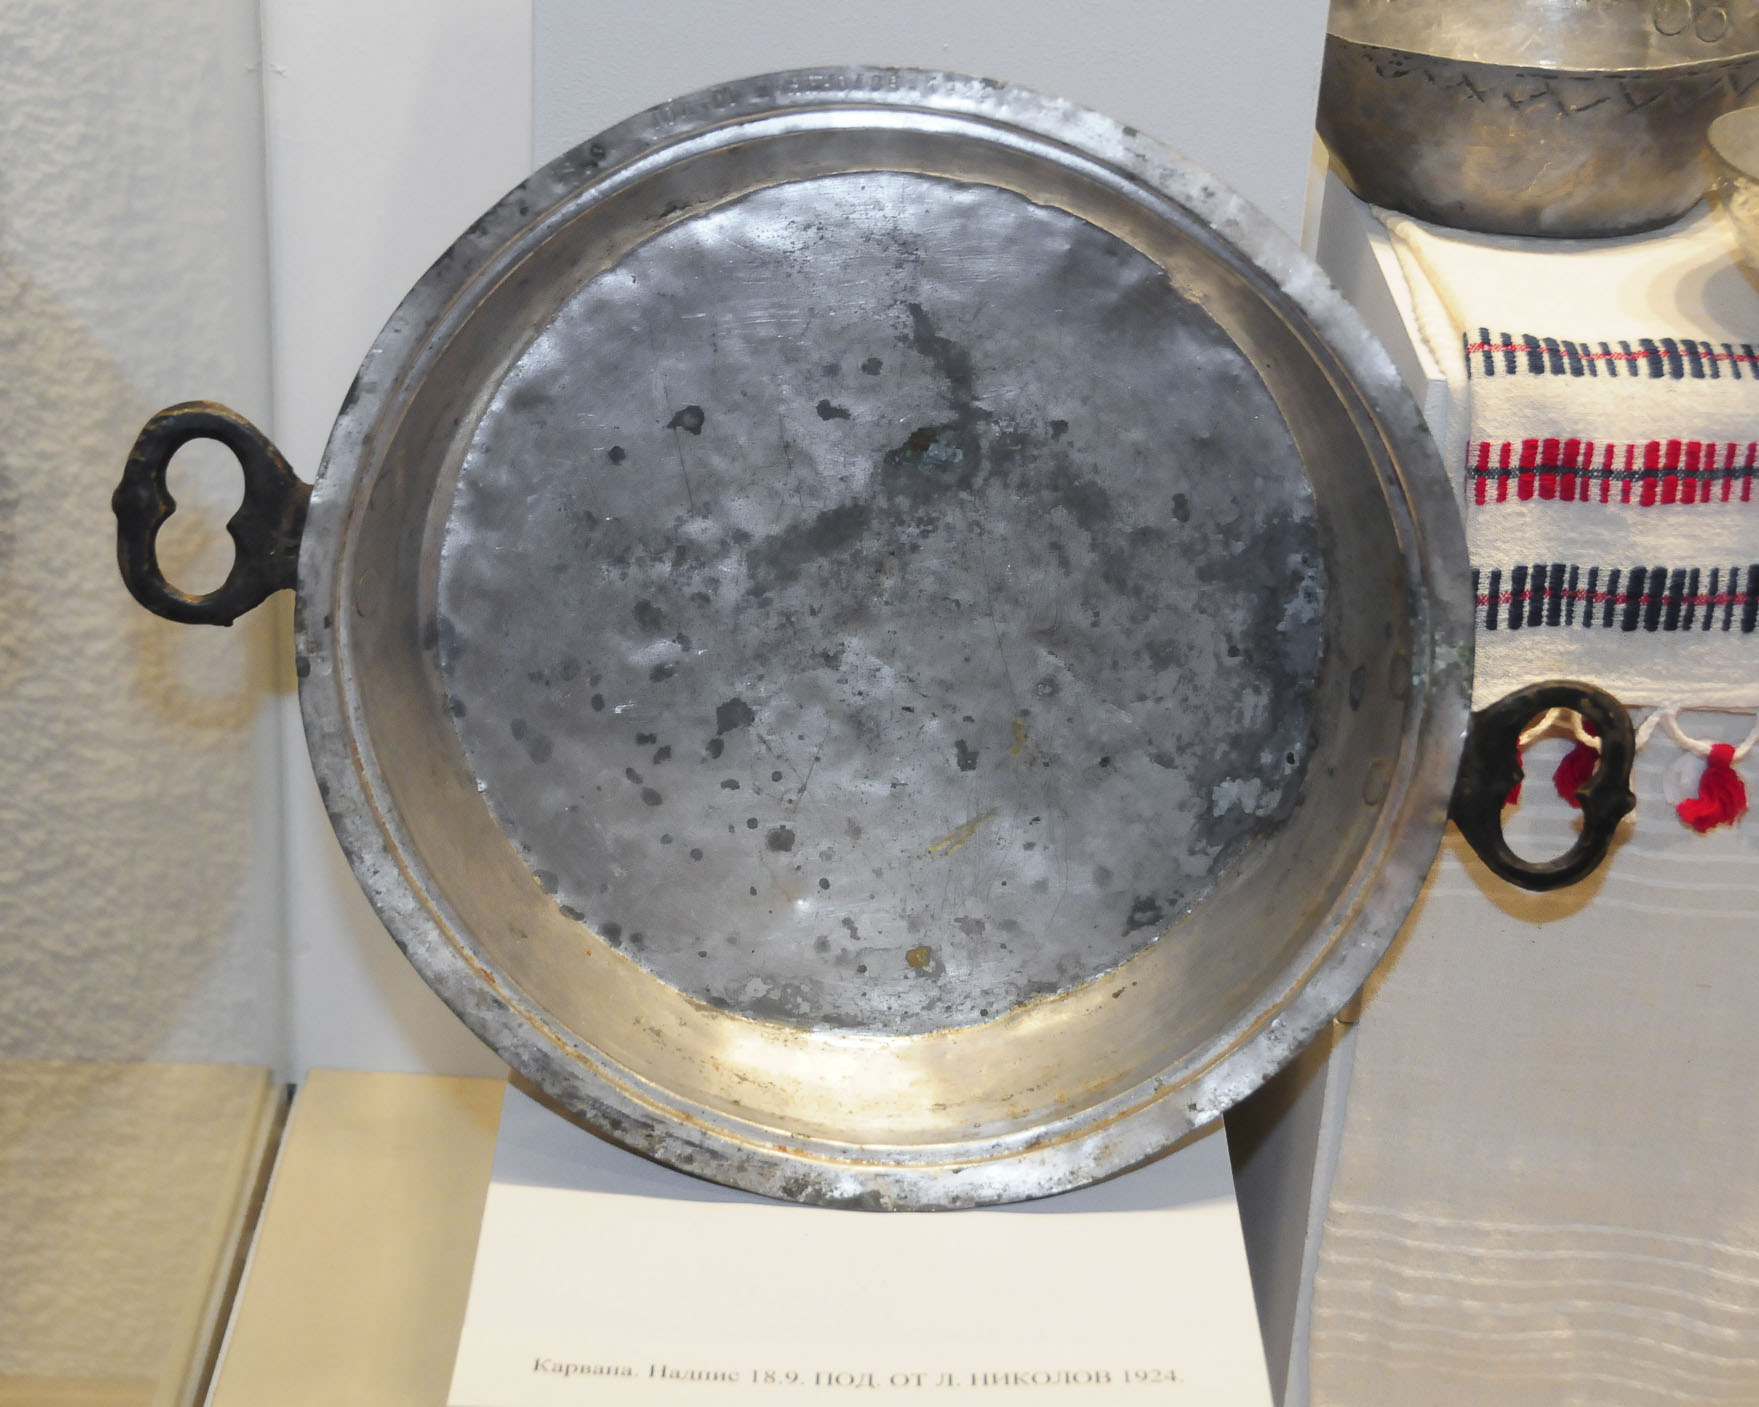 troyan-museum-mednikarstvo-ot-troyanskiq-krai-21